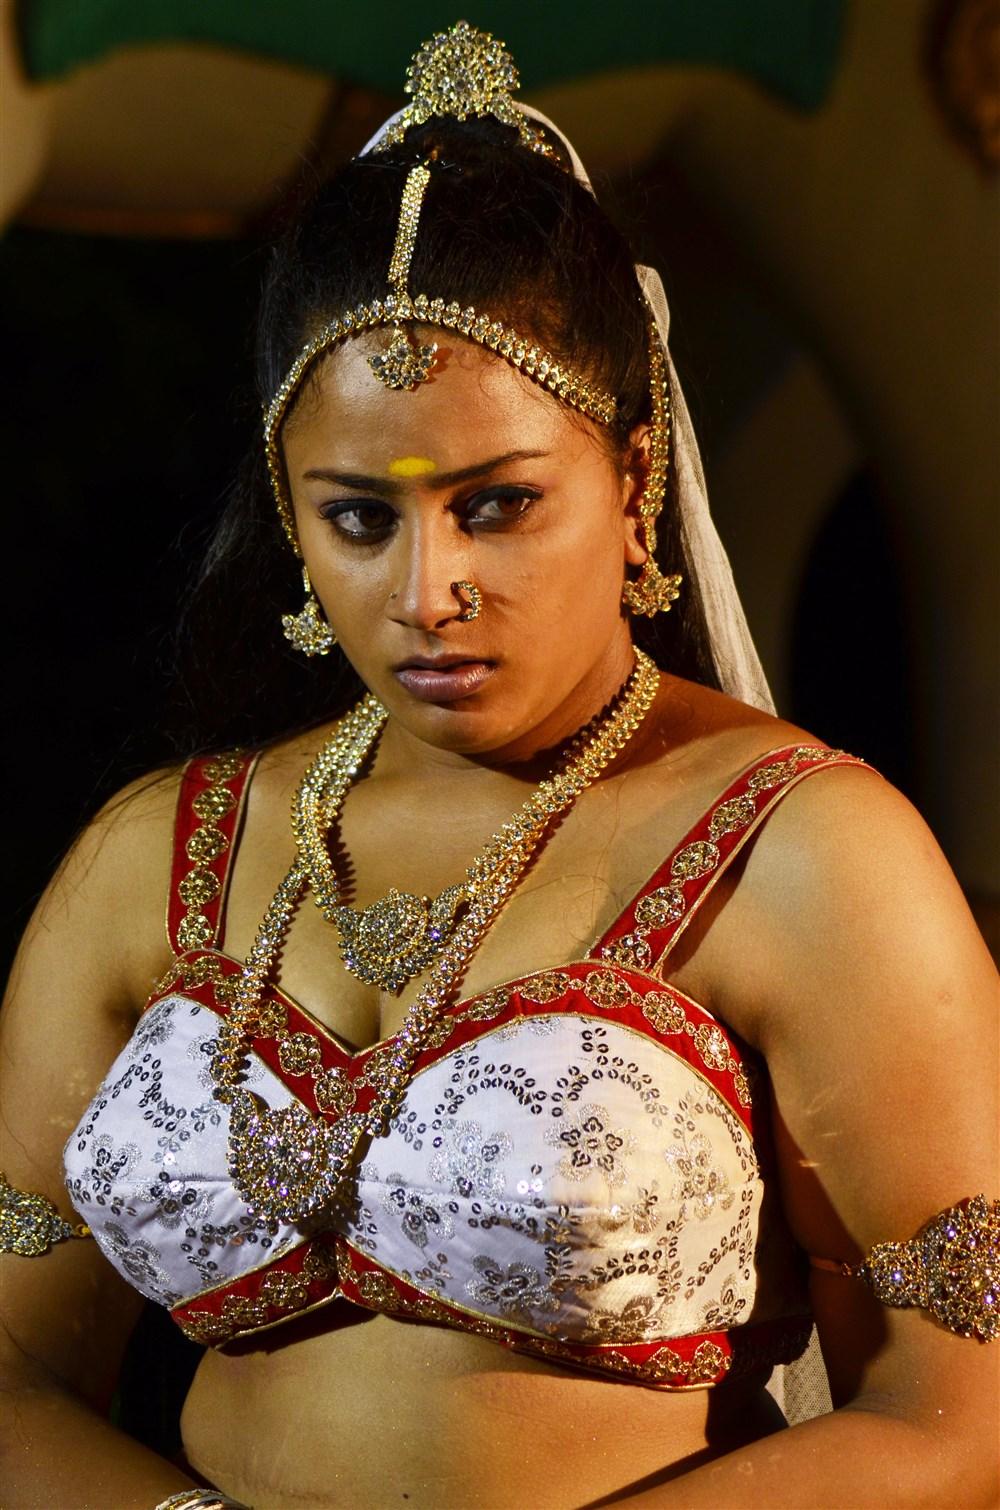 Tamil Cinema New Mayamohini Movie Stills - SHINER PHOTOS